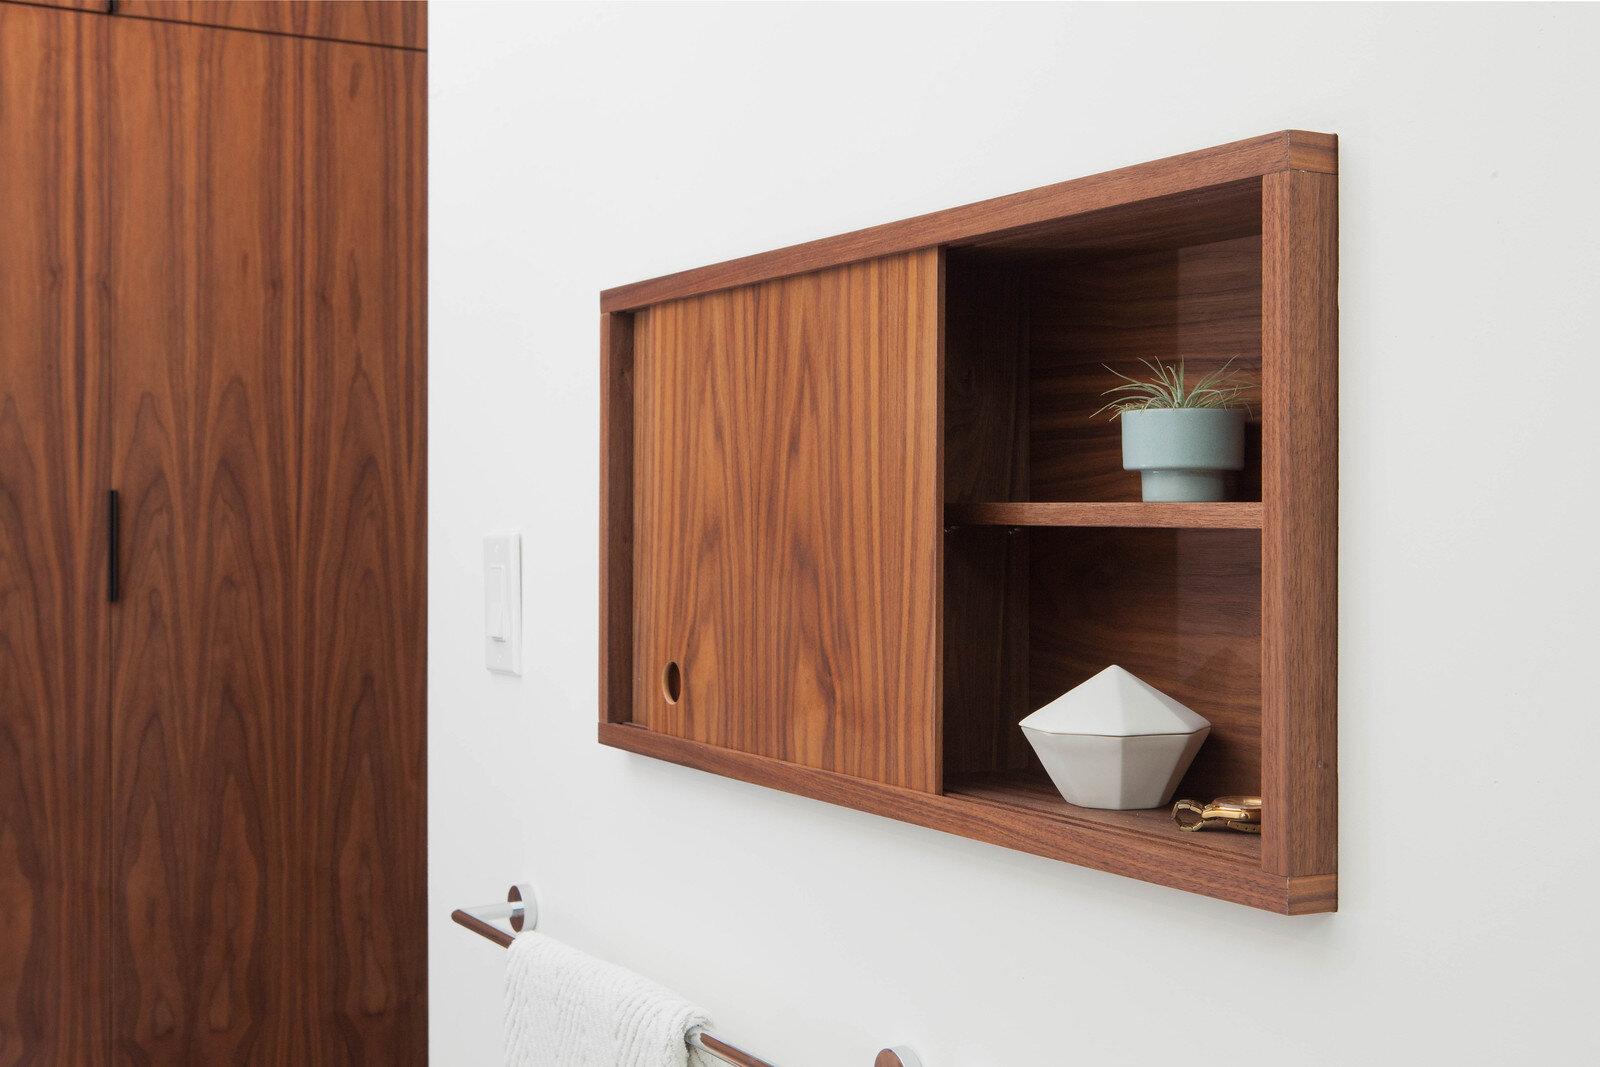 eichler-custom-wood-niche.jpg